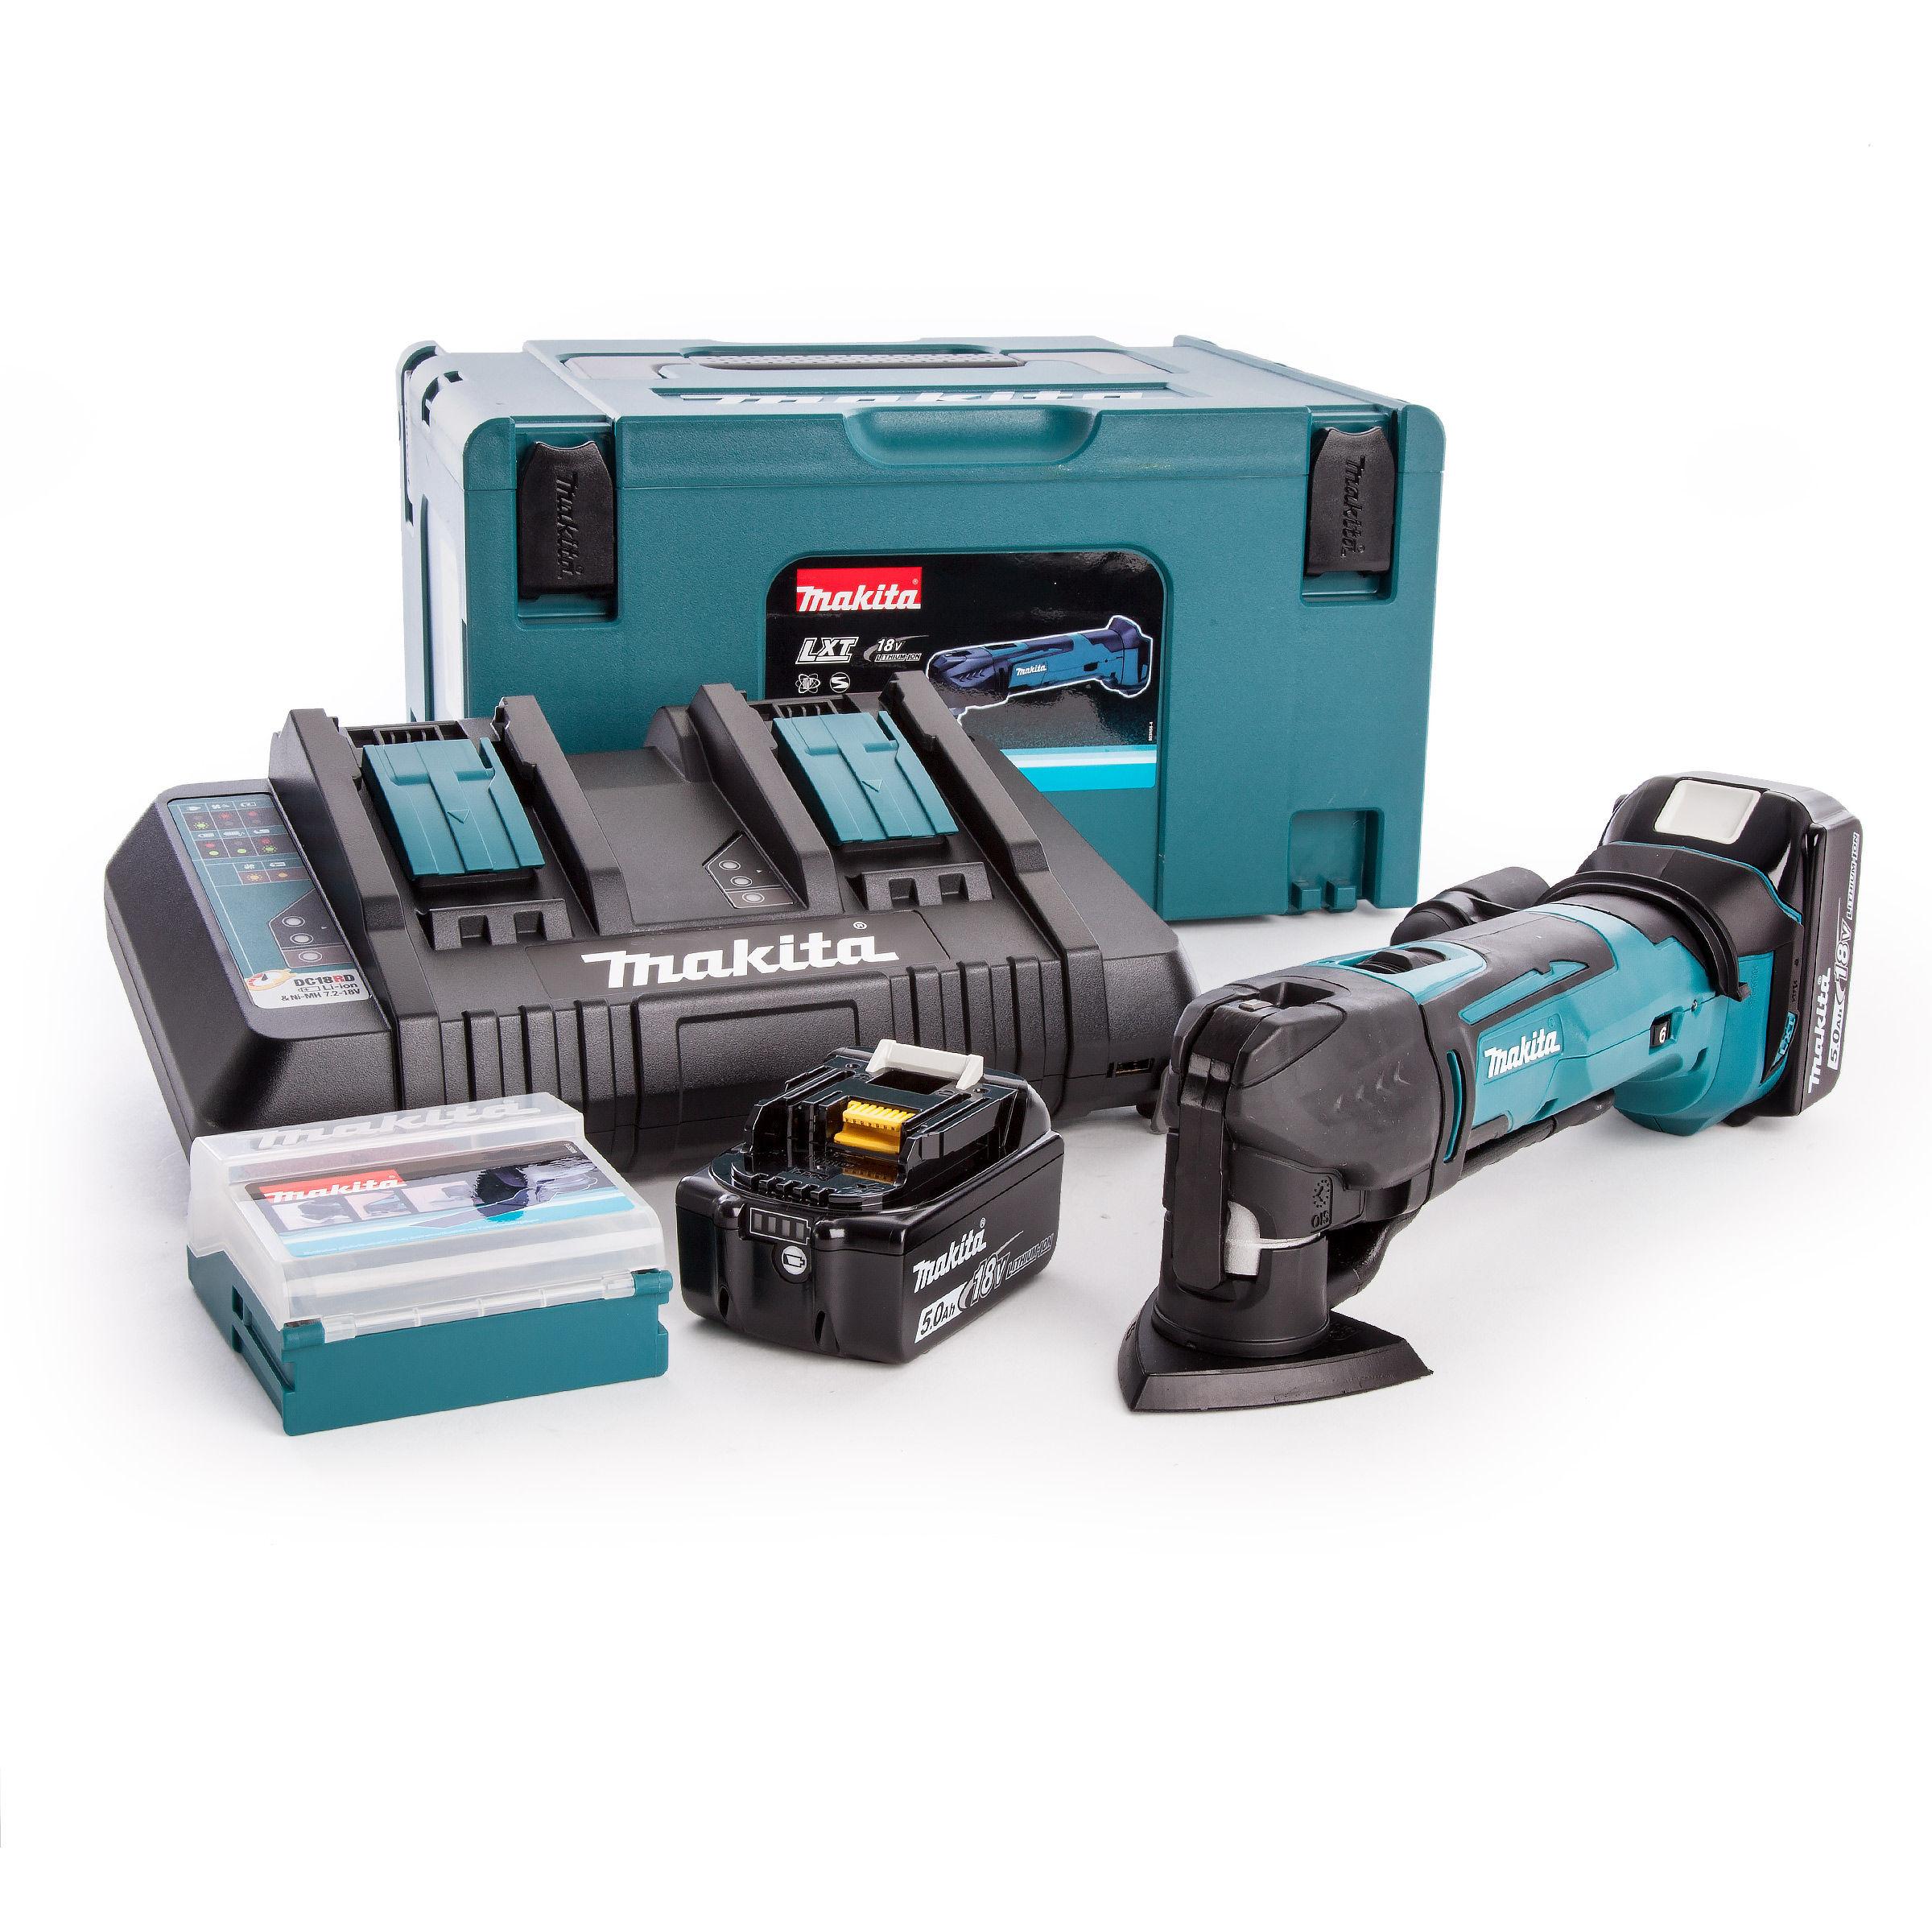 Extra 8 Pcs Accessories Makita DTM51Z 18V LXT Oscillating Multitool Mak Case